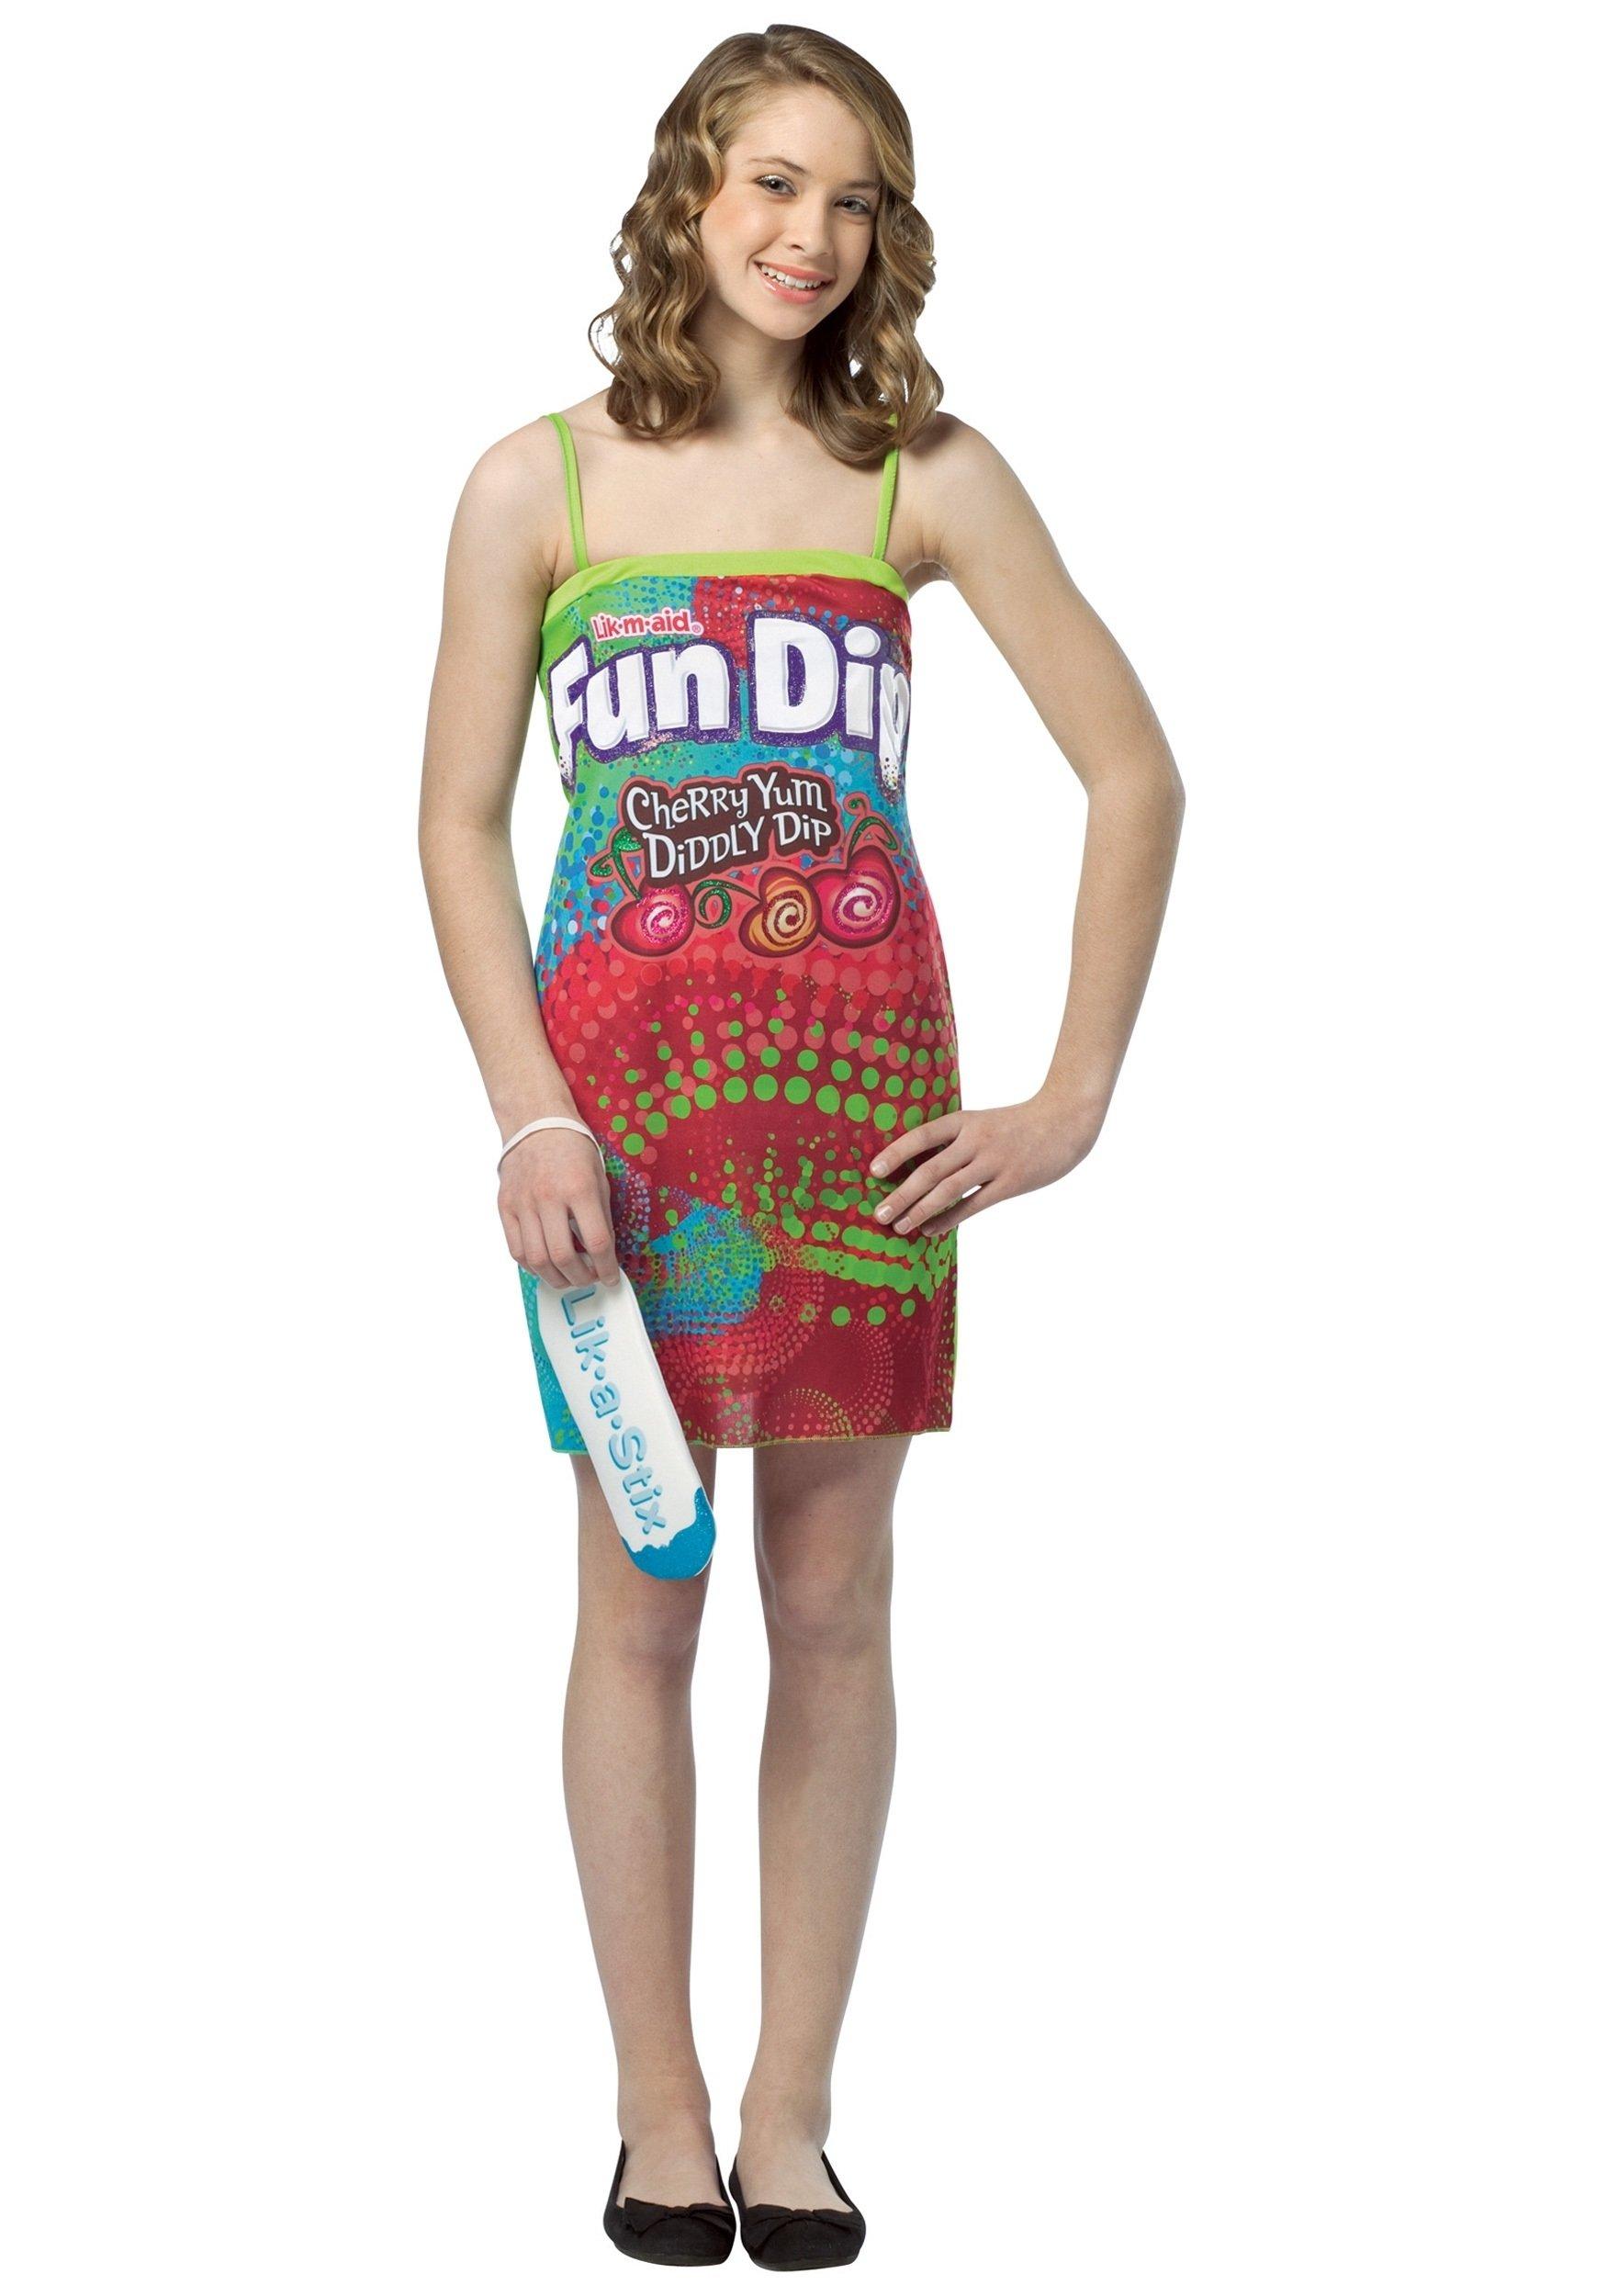 10 Perfect Teen Girl Halloween Costume Ideas teen fun dip dress halloween pinterest teen fun fun  sc 1 st  Unique Ideas 2018 & 10 Perfect Teen Girl Halloween Costume Ideas